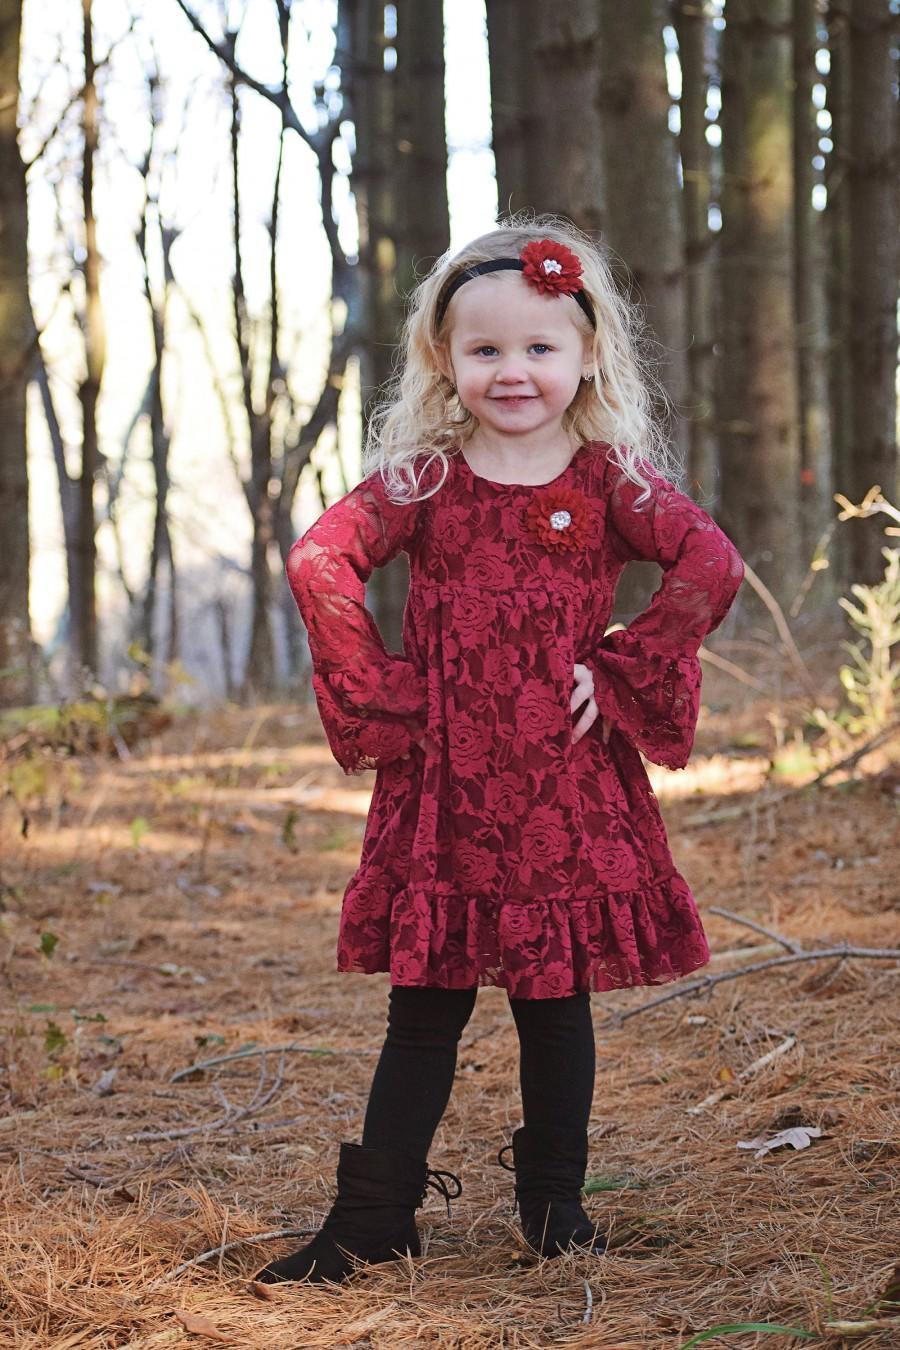 Wedding - Burgundy Long sleeve Flower Girl Dresses- Christmas Dress- Maroon Lace dress- Ivory Rustic Girls Dress- Baby Lace Dress- Junior Bridesmaid